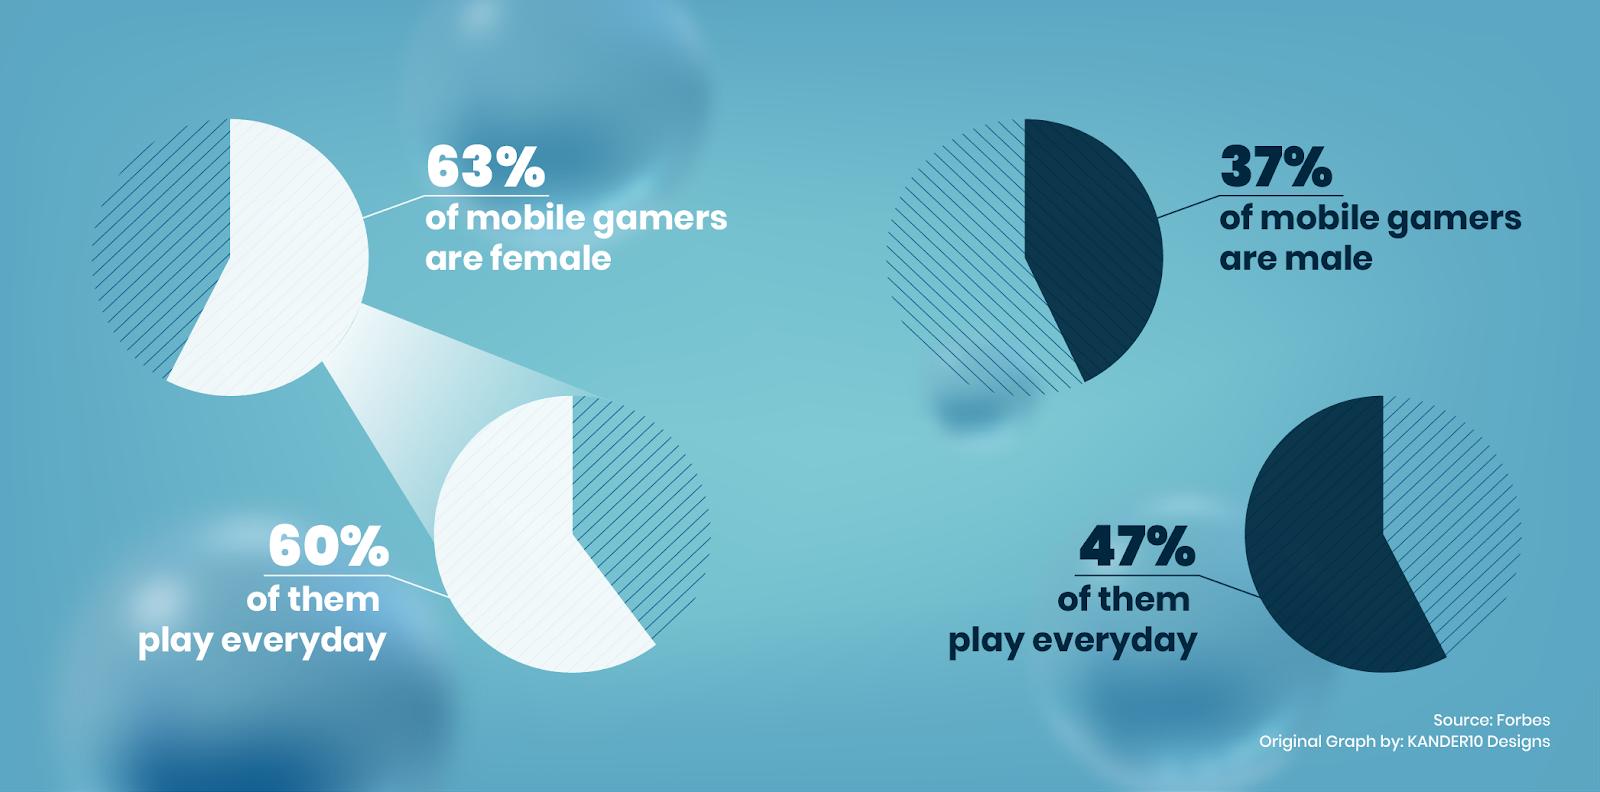 Mobile gaming by gender.